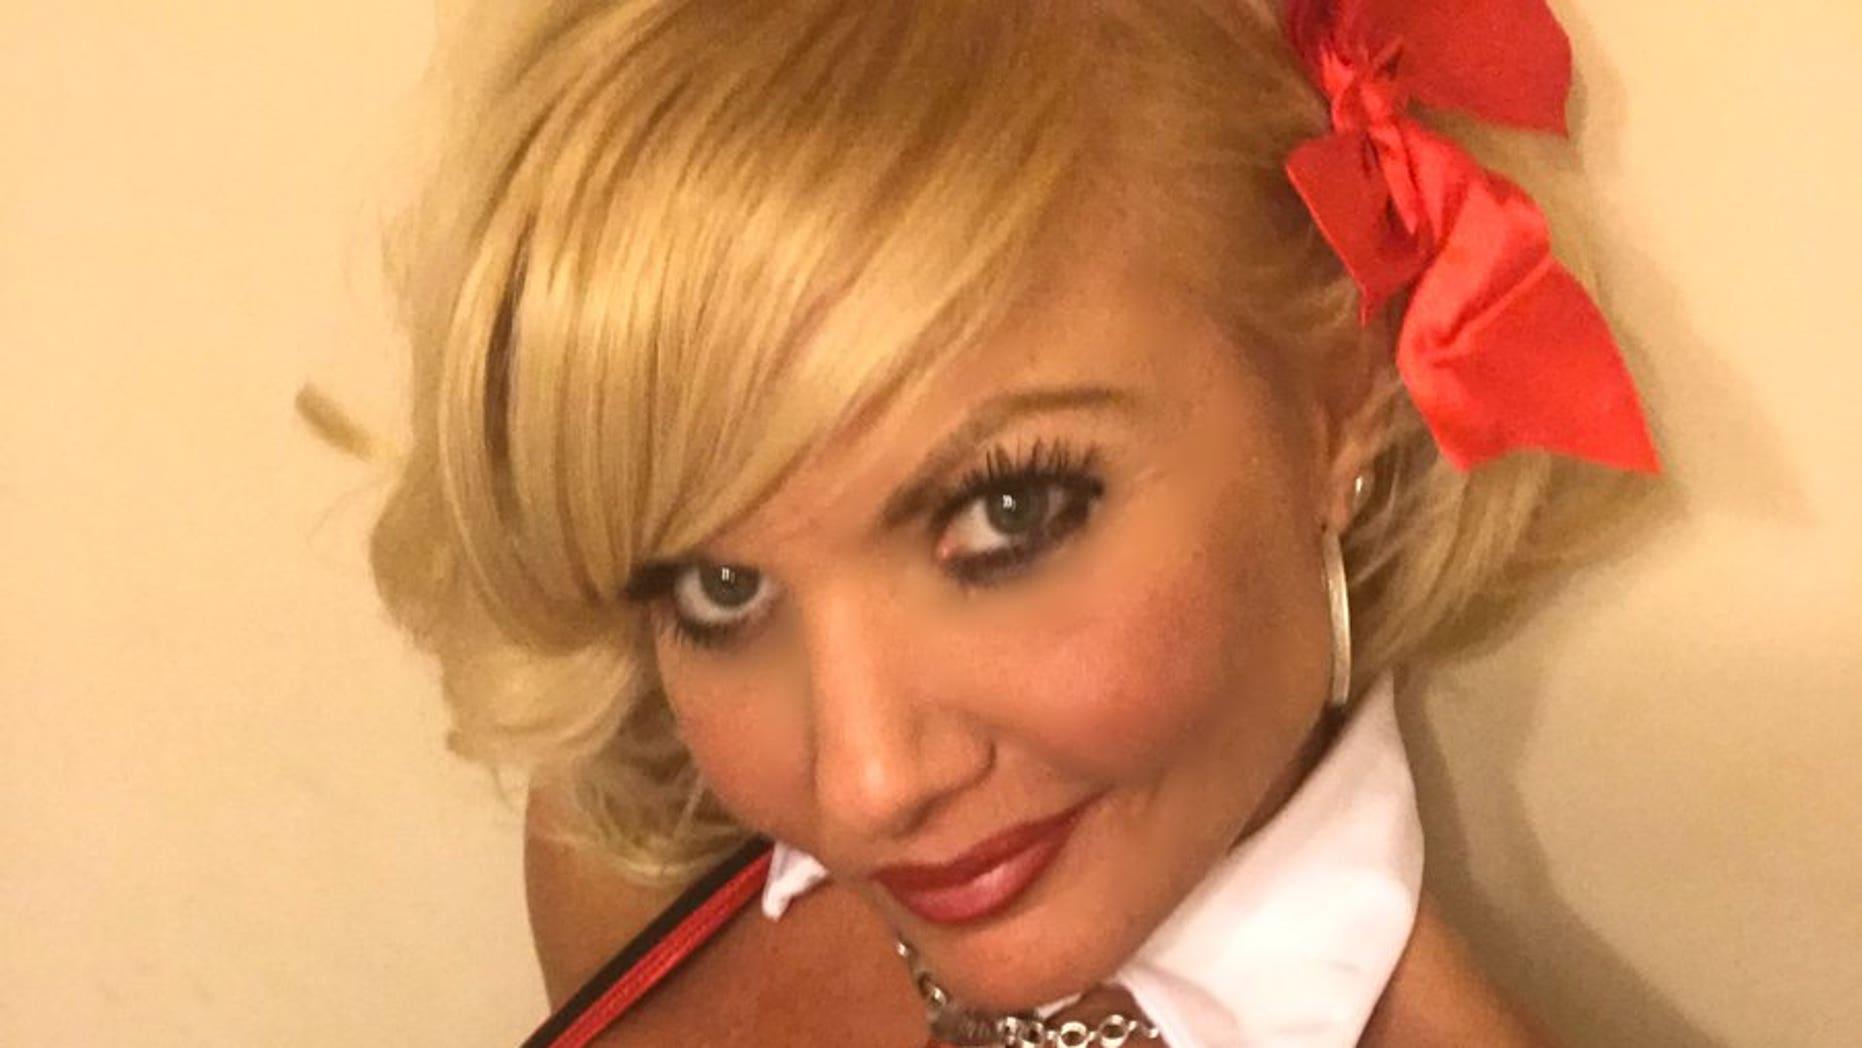 Alabama mom and adult performer Kathleen Dawn West, 42, was found dead Jan. 13.